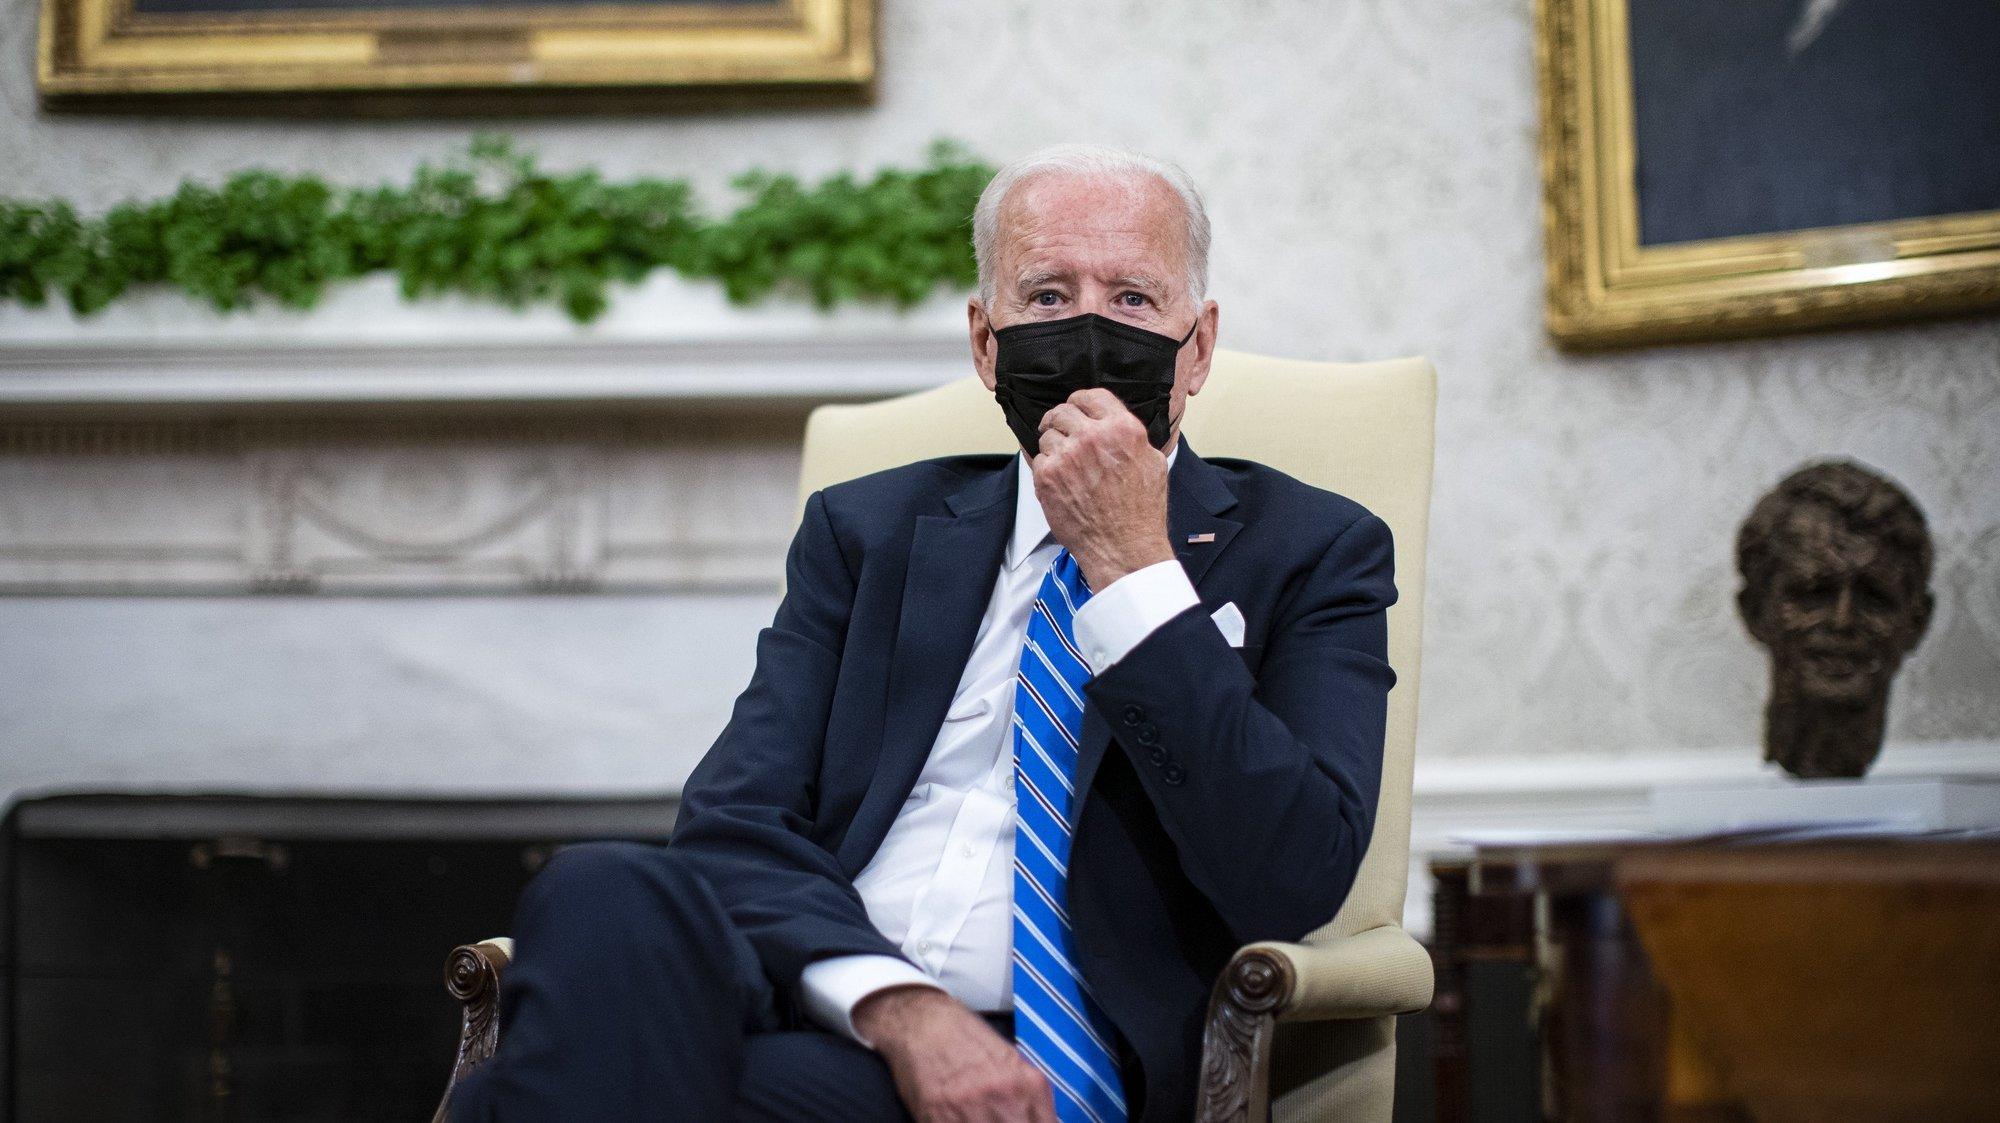 epa09480657 US President Joe Biden meets with British Prime Minister Boris Johnson in the Oval Office of the White House, in Washington, DC, USA, 21 September 2021.  EPA/Al Drago / POOL